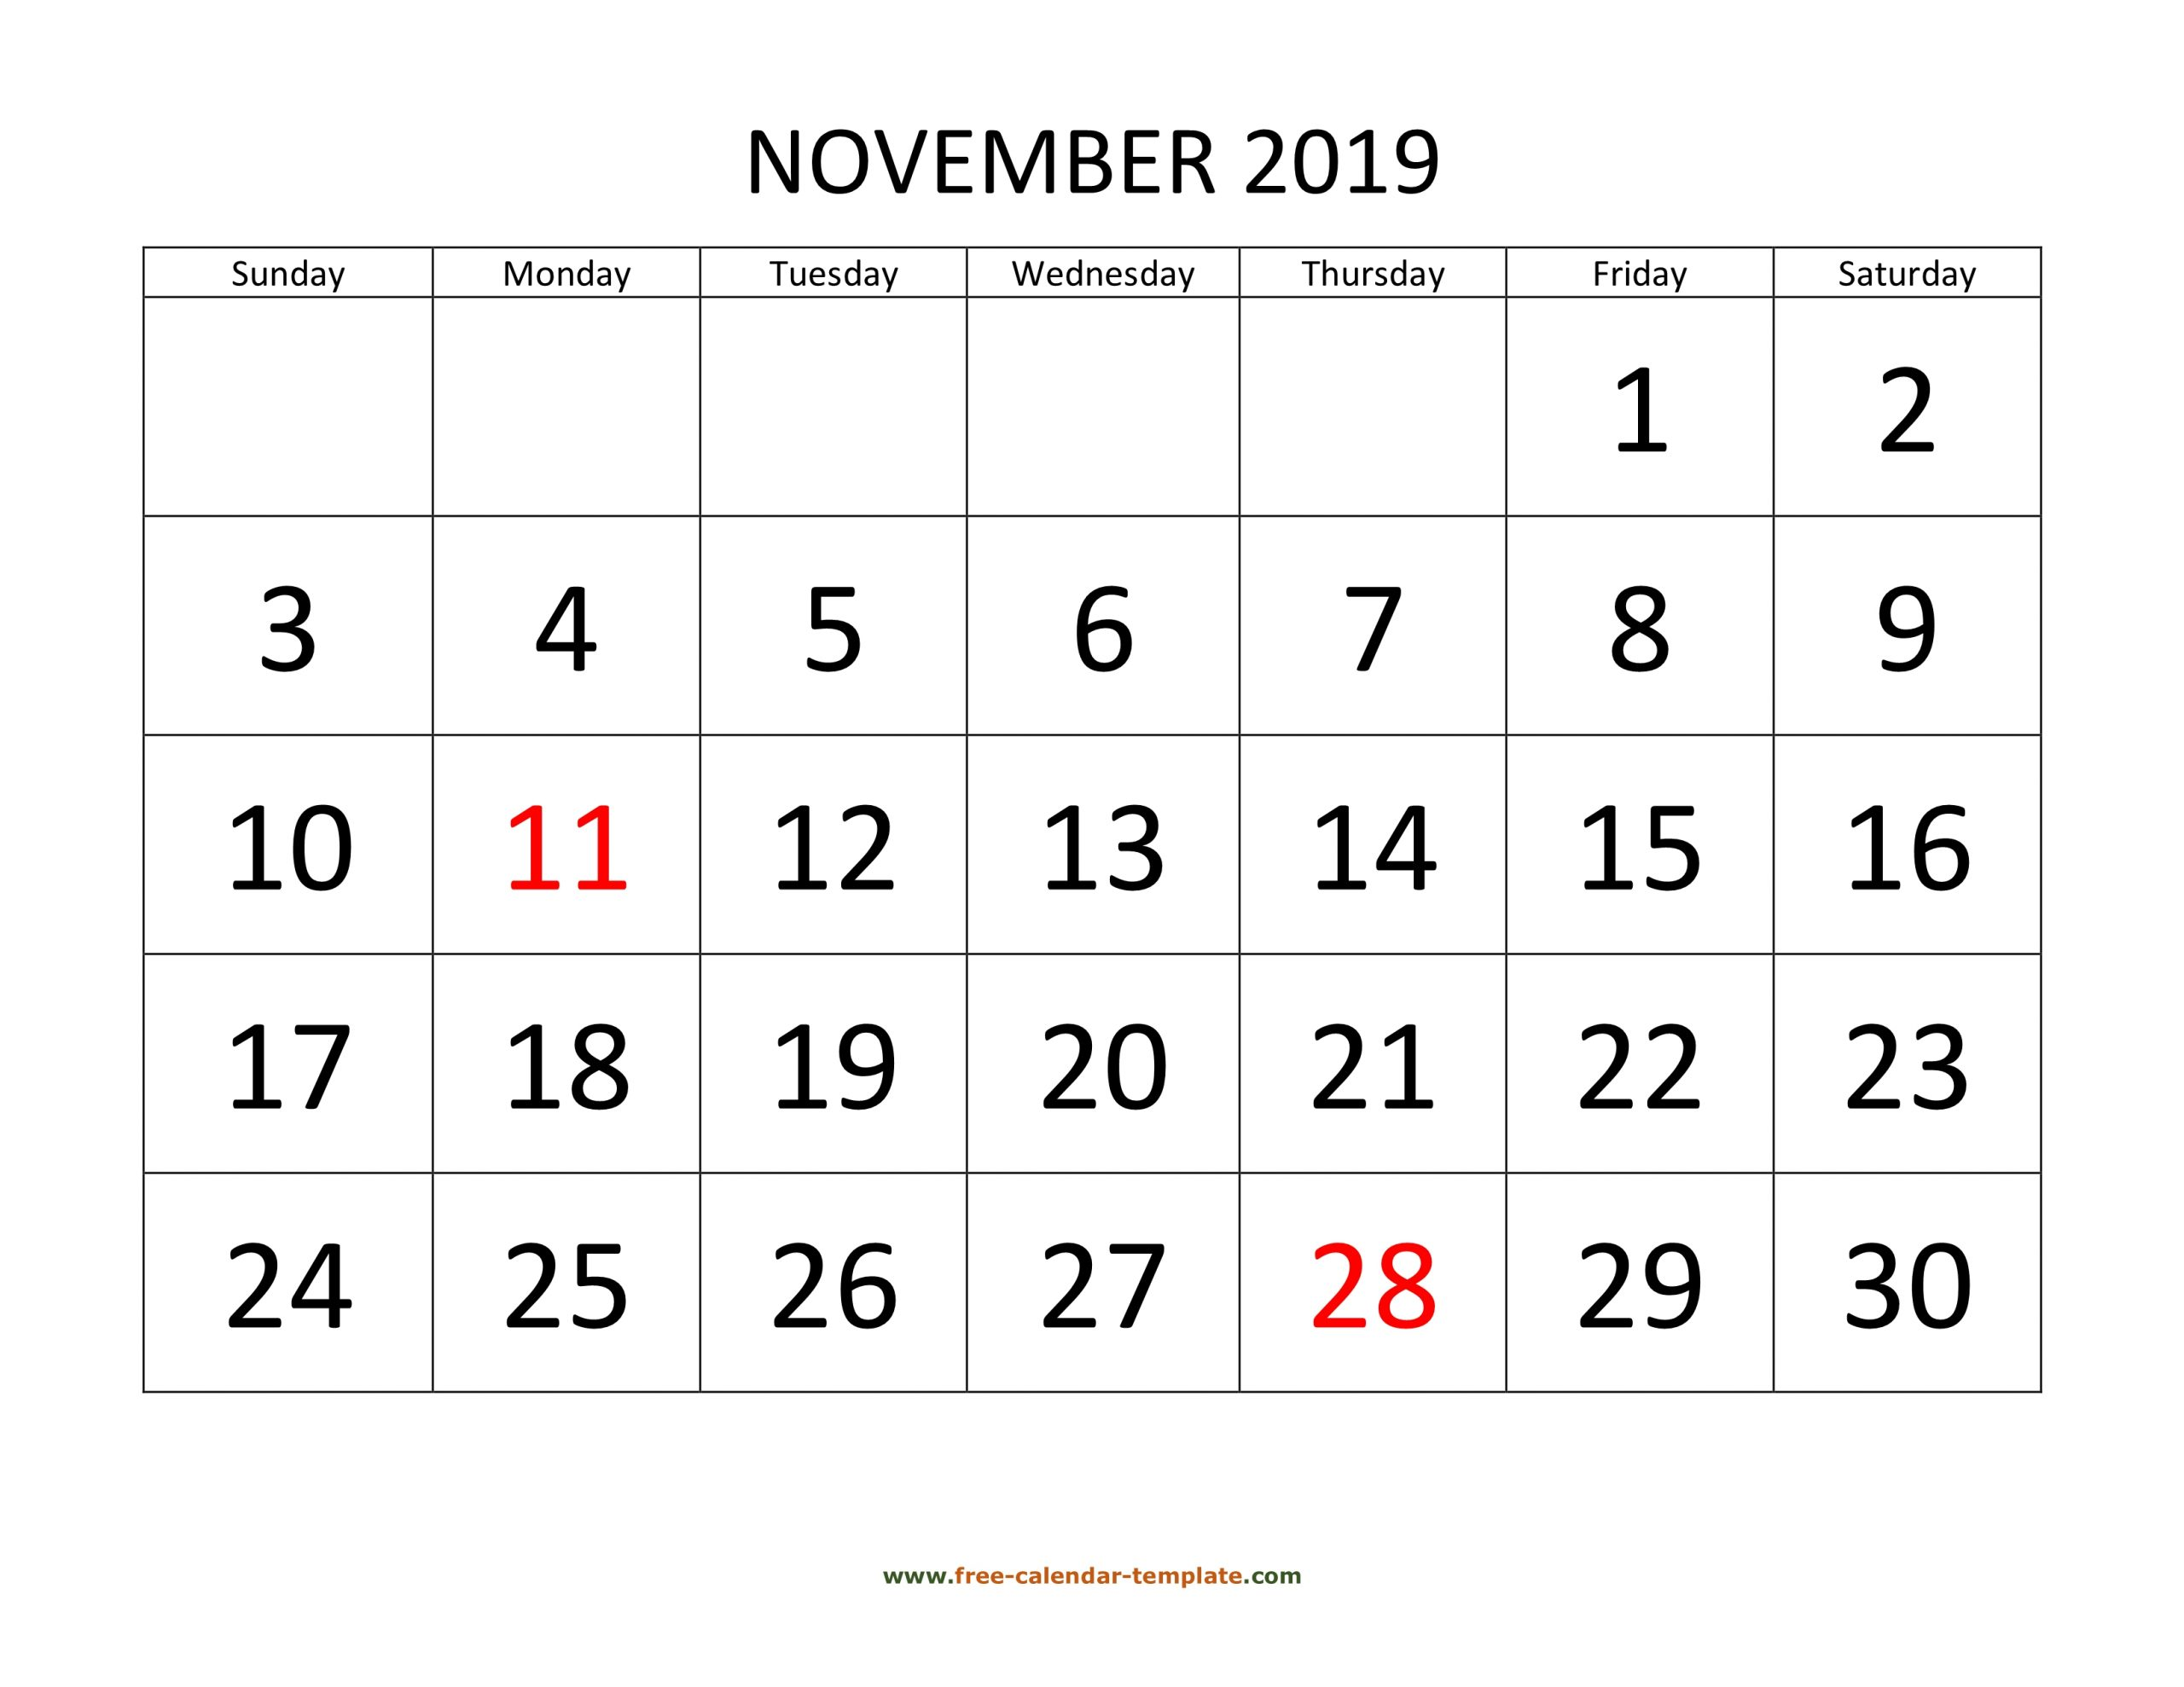 November 2019 Calendar Designed With Large Font (Horizontal